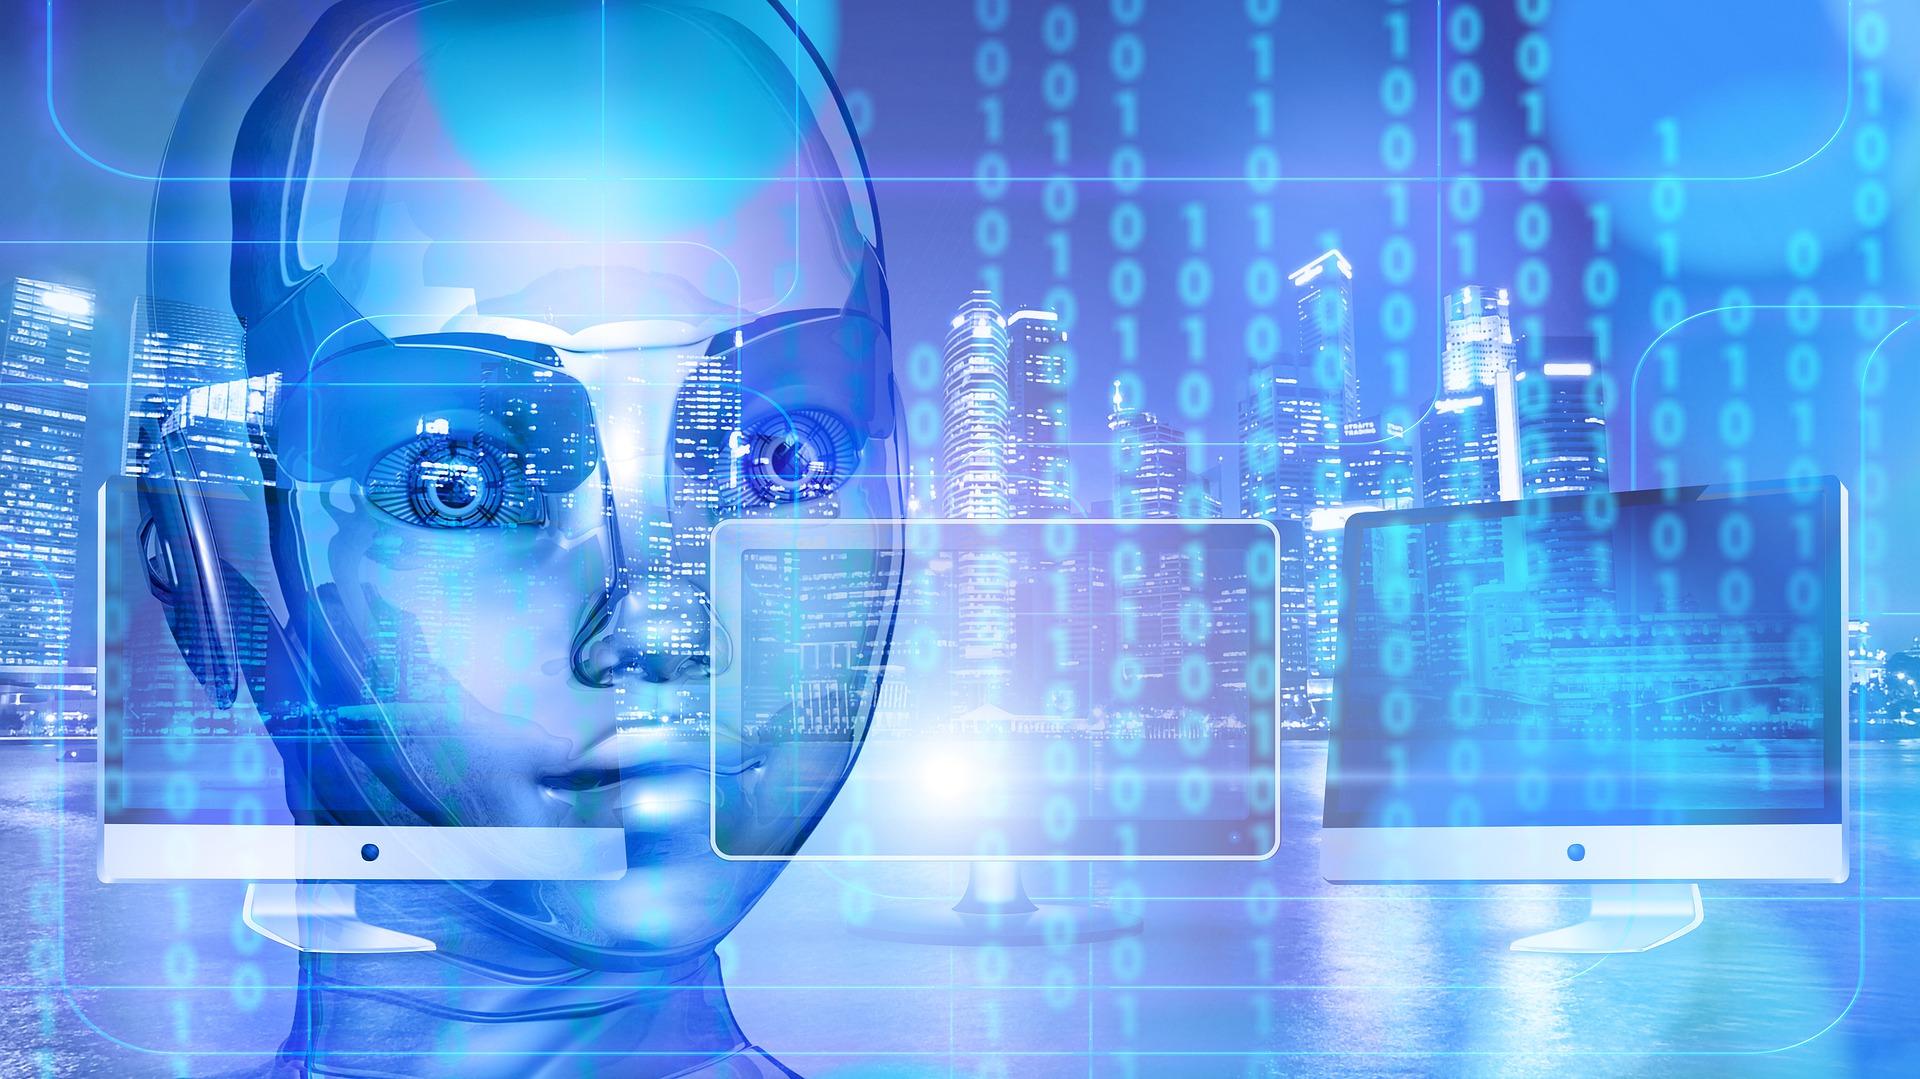 Робот-консултант ще обслужва клиентите на Citigroup